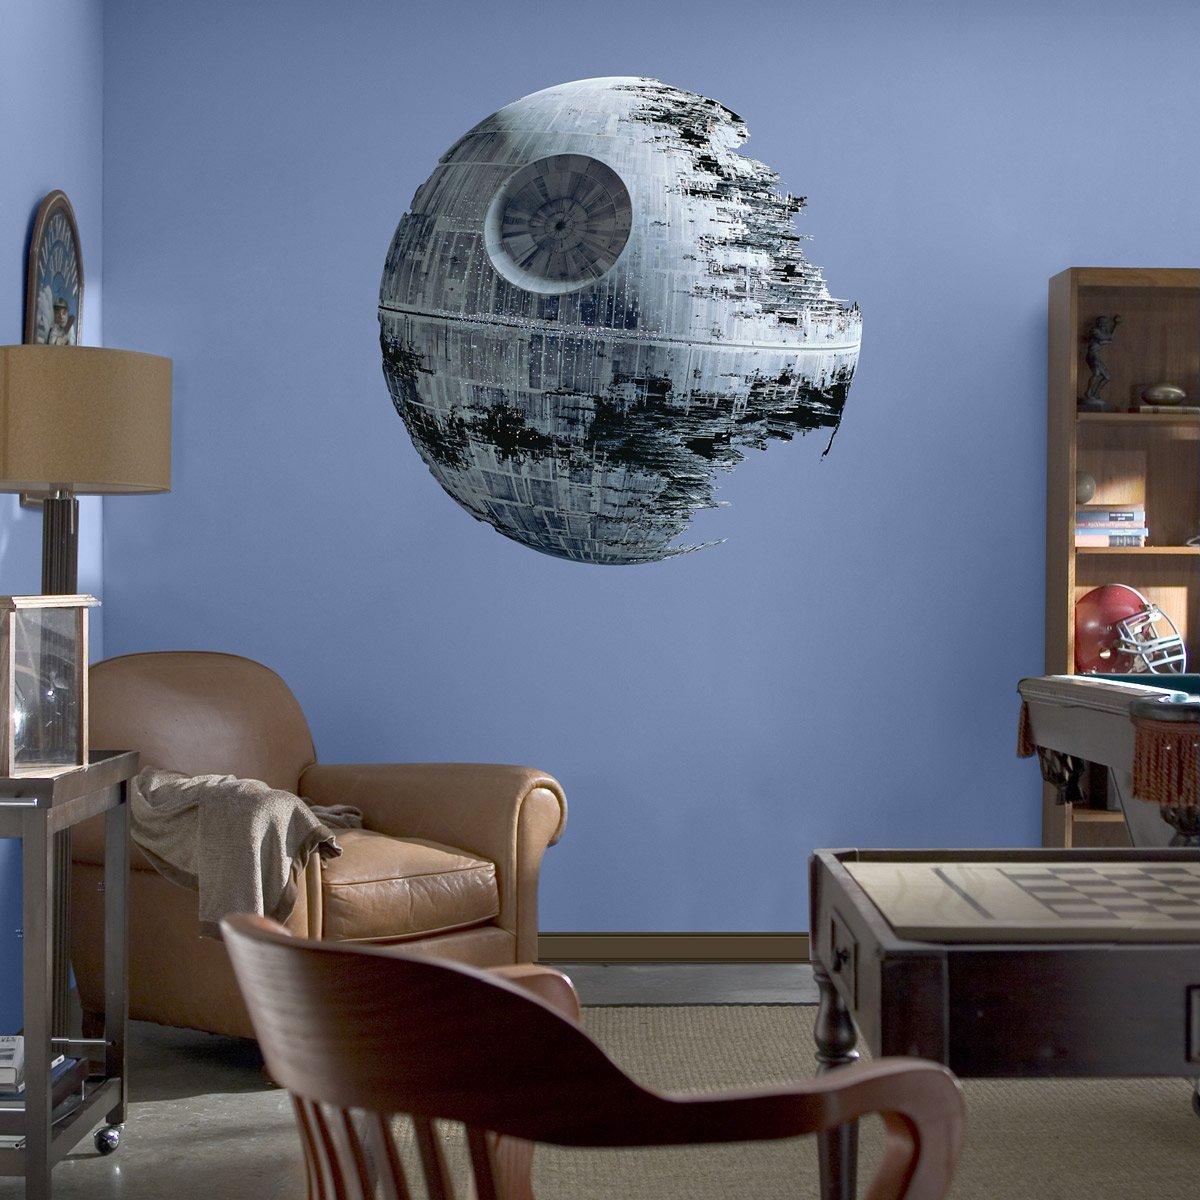 Star Wars Death Star Ii Giant Fathead Wall Graphic